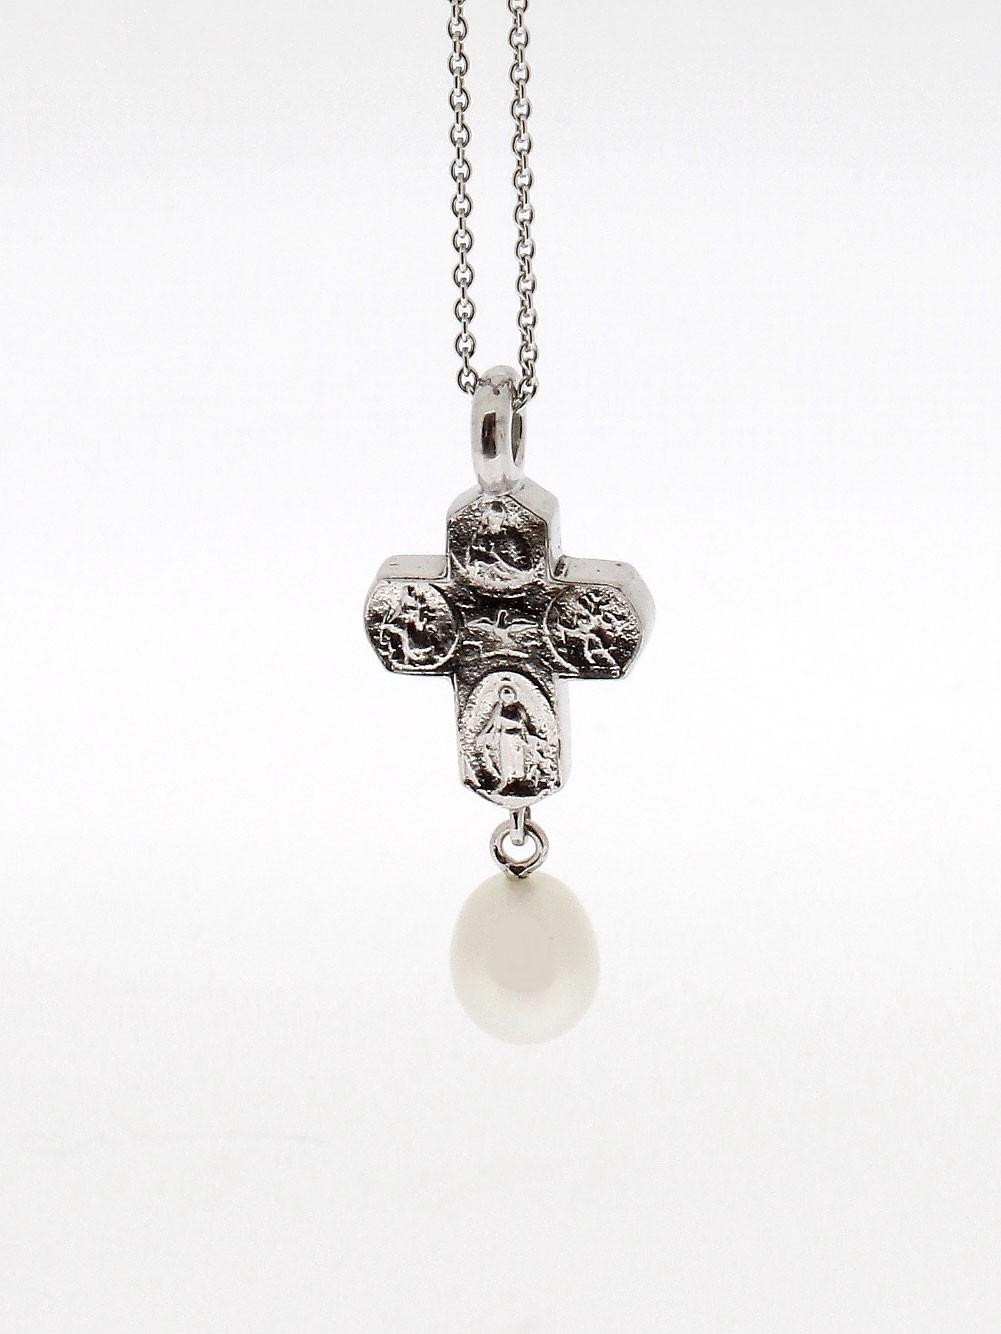 Anhänger Kreuz Perle Silber - GalerieVoigt - 4021KH-P